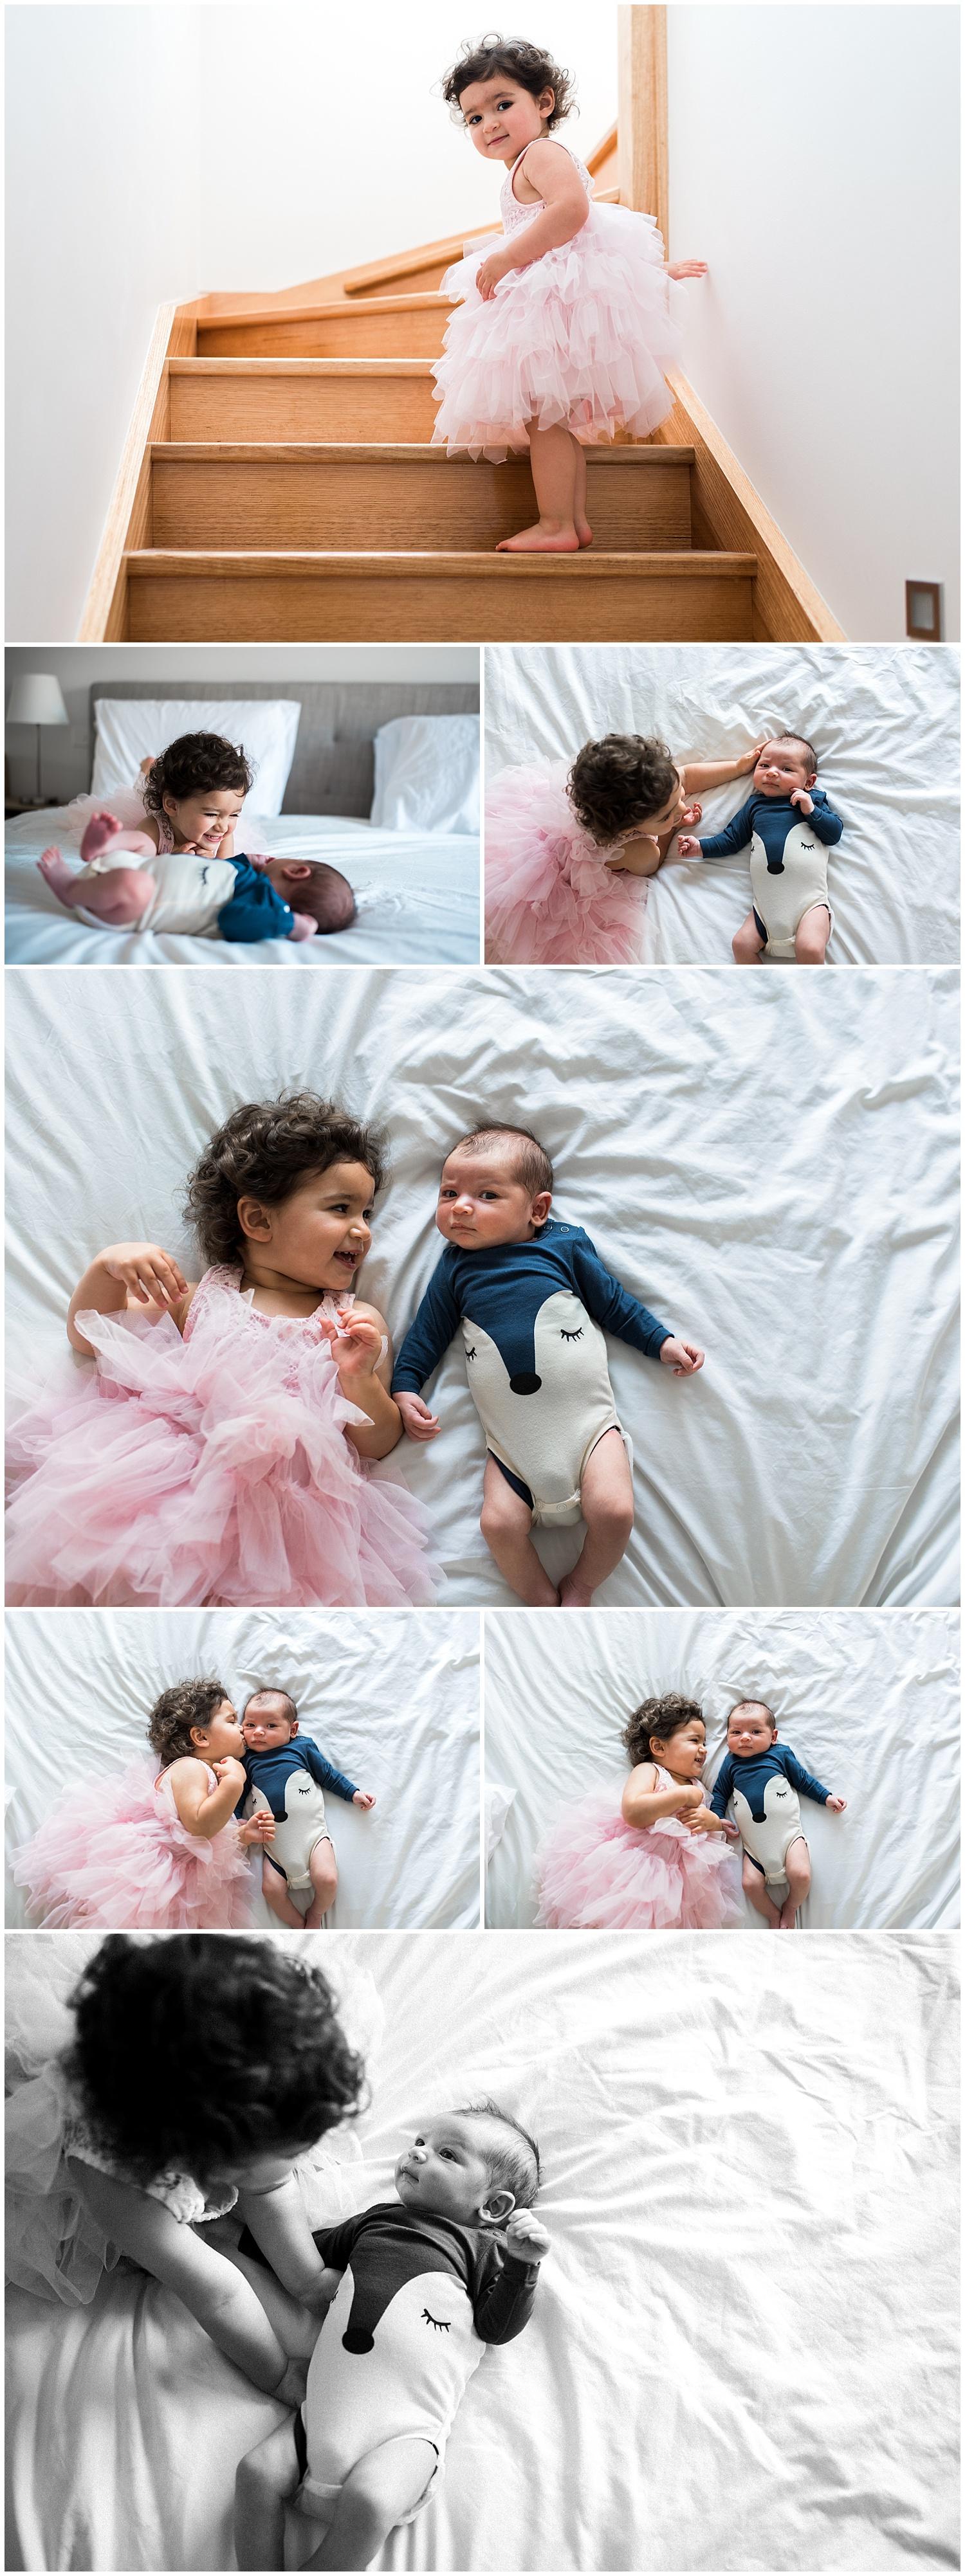 caulfield newborn lifestyle photographer